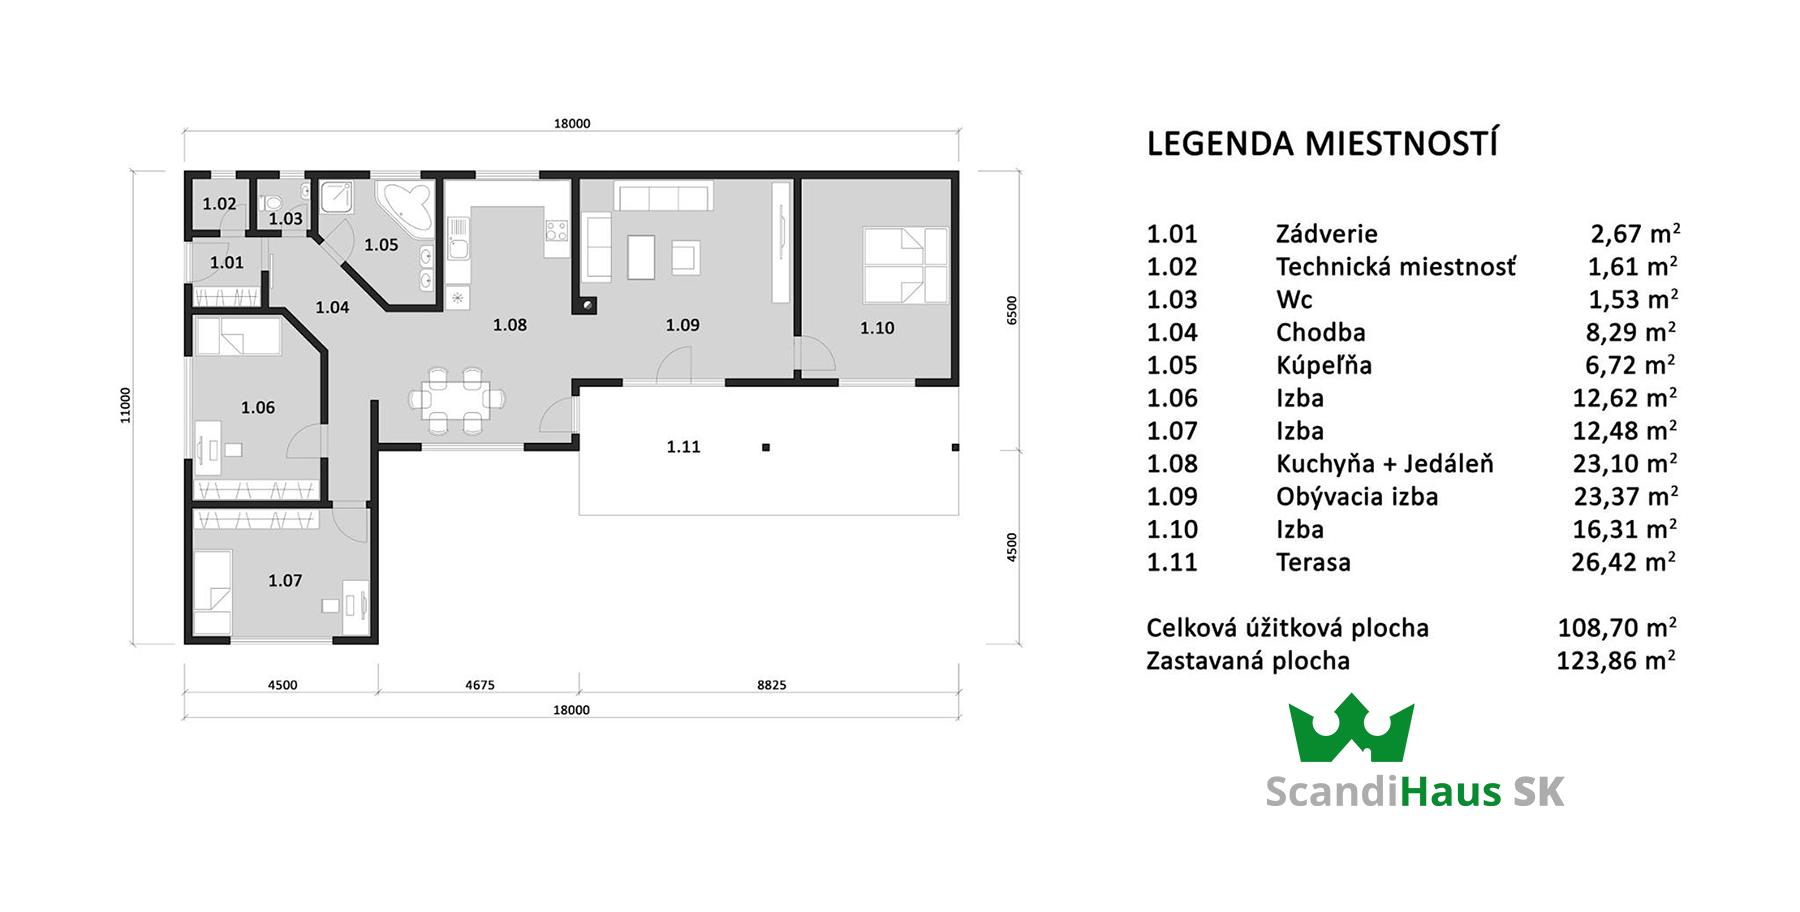 scandihaus-07-projekt-tb21